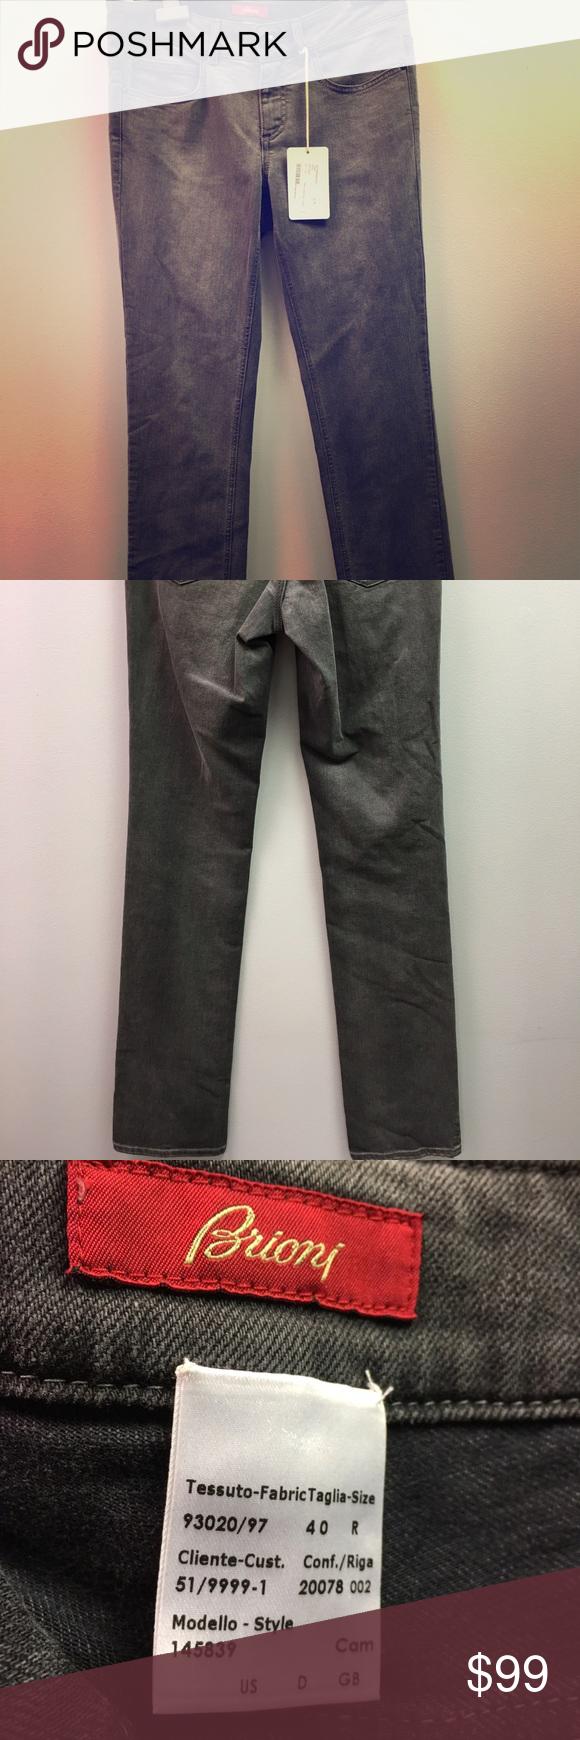 Brioni jean HUGE Discount Retail Price!!! Authentic Brioni Brand New // Cotton Brioni Jeans Skinny